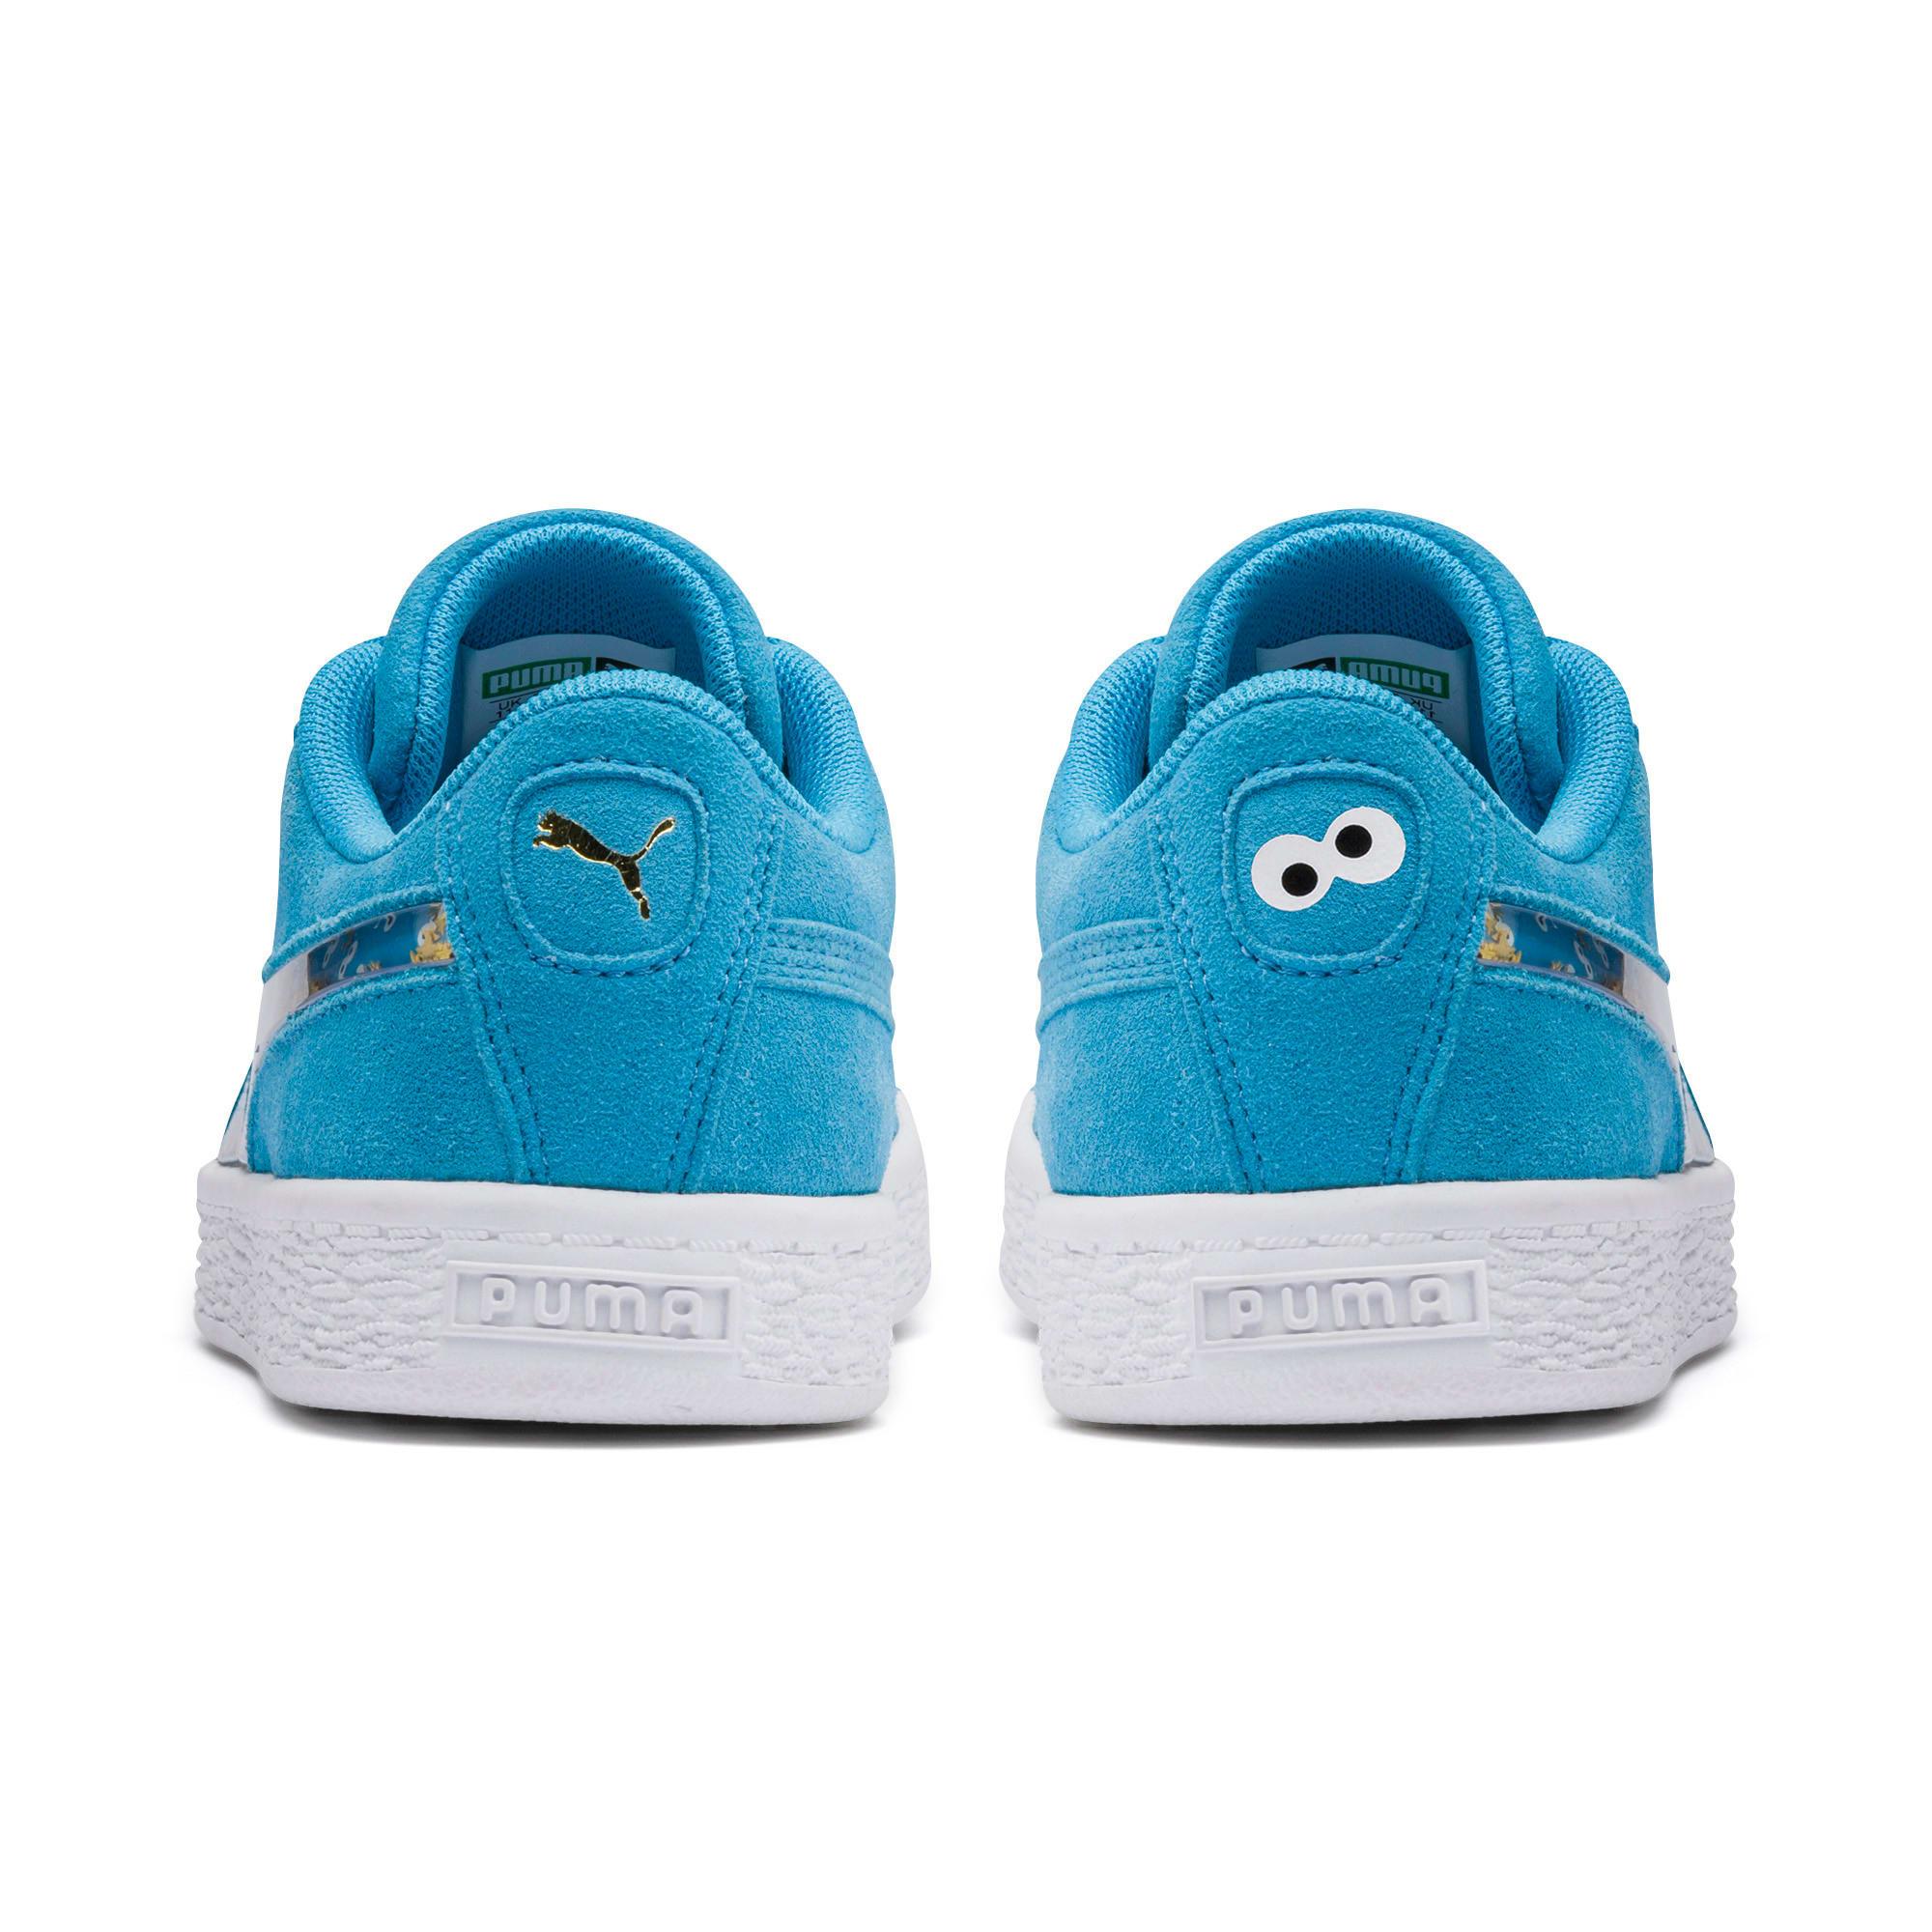 Thumbnail 3 of Sesamstraße 50 Suede Statement Kids Sneaker, Bleu Azur-Puma White, medium